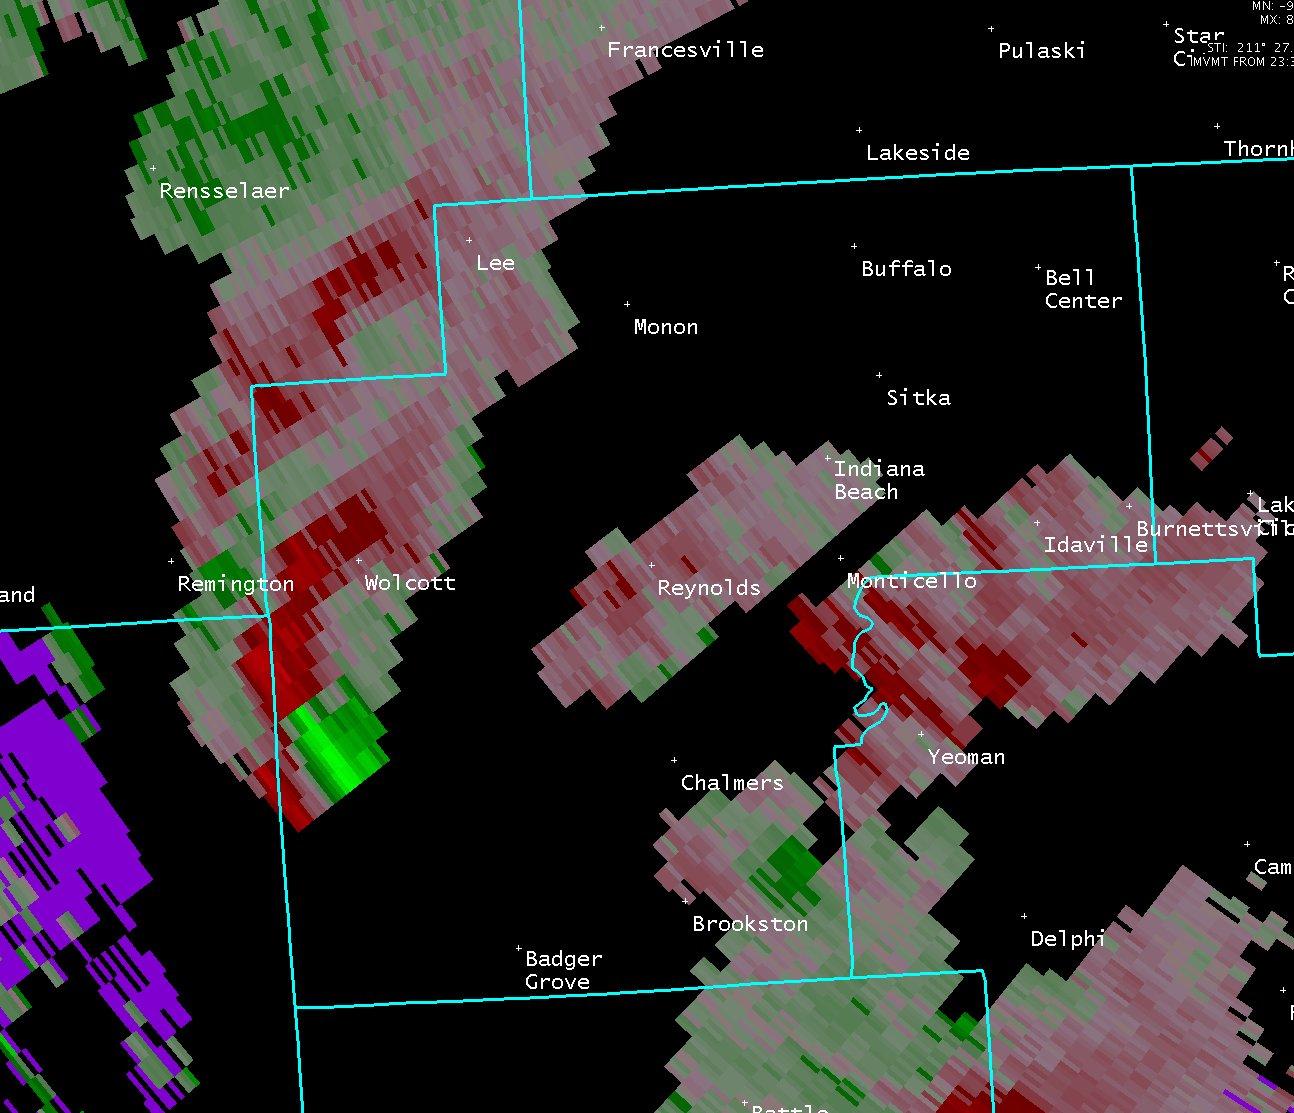 Indiana white county chalmers - Radar Image Radar Image